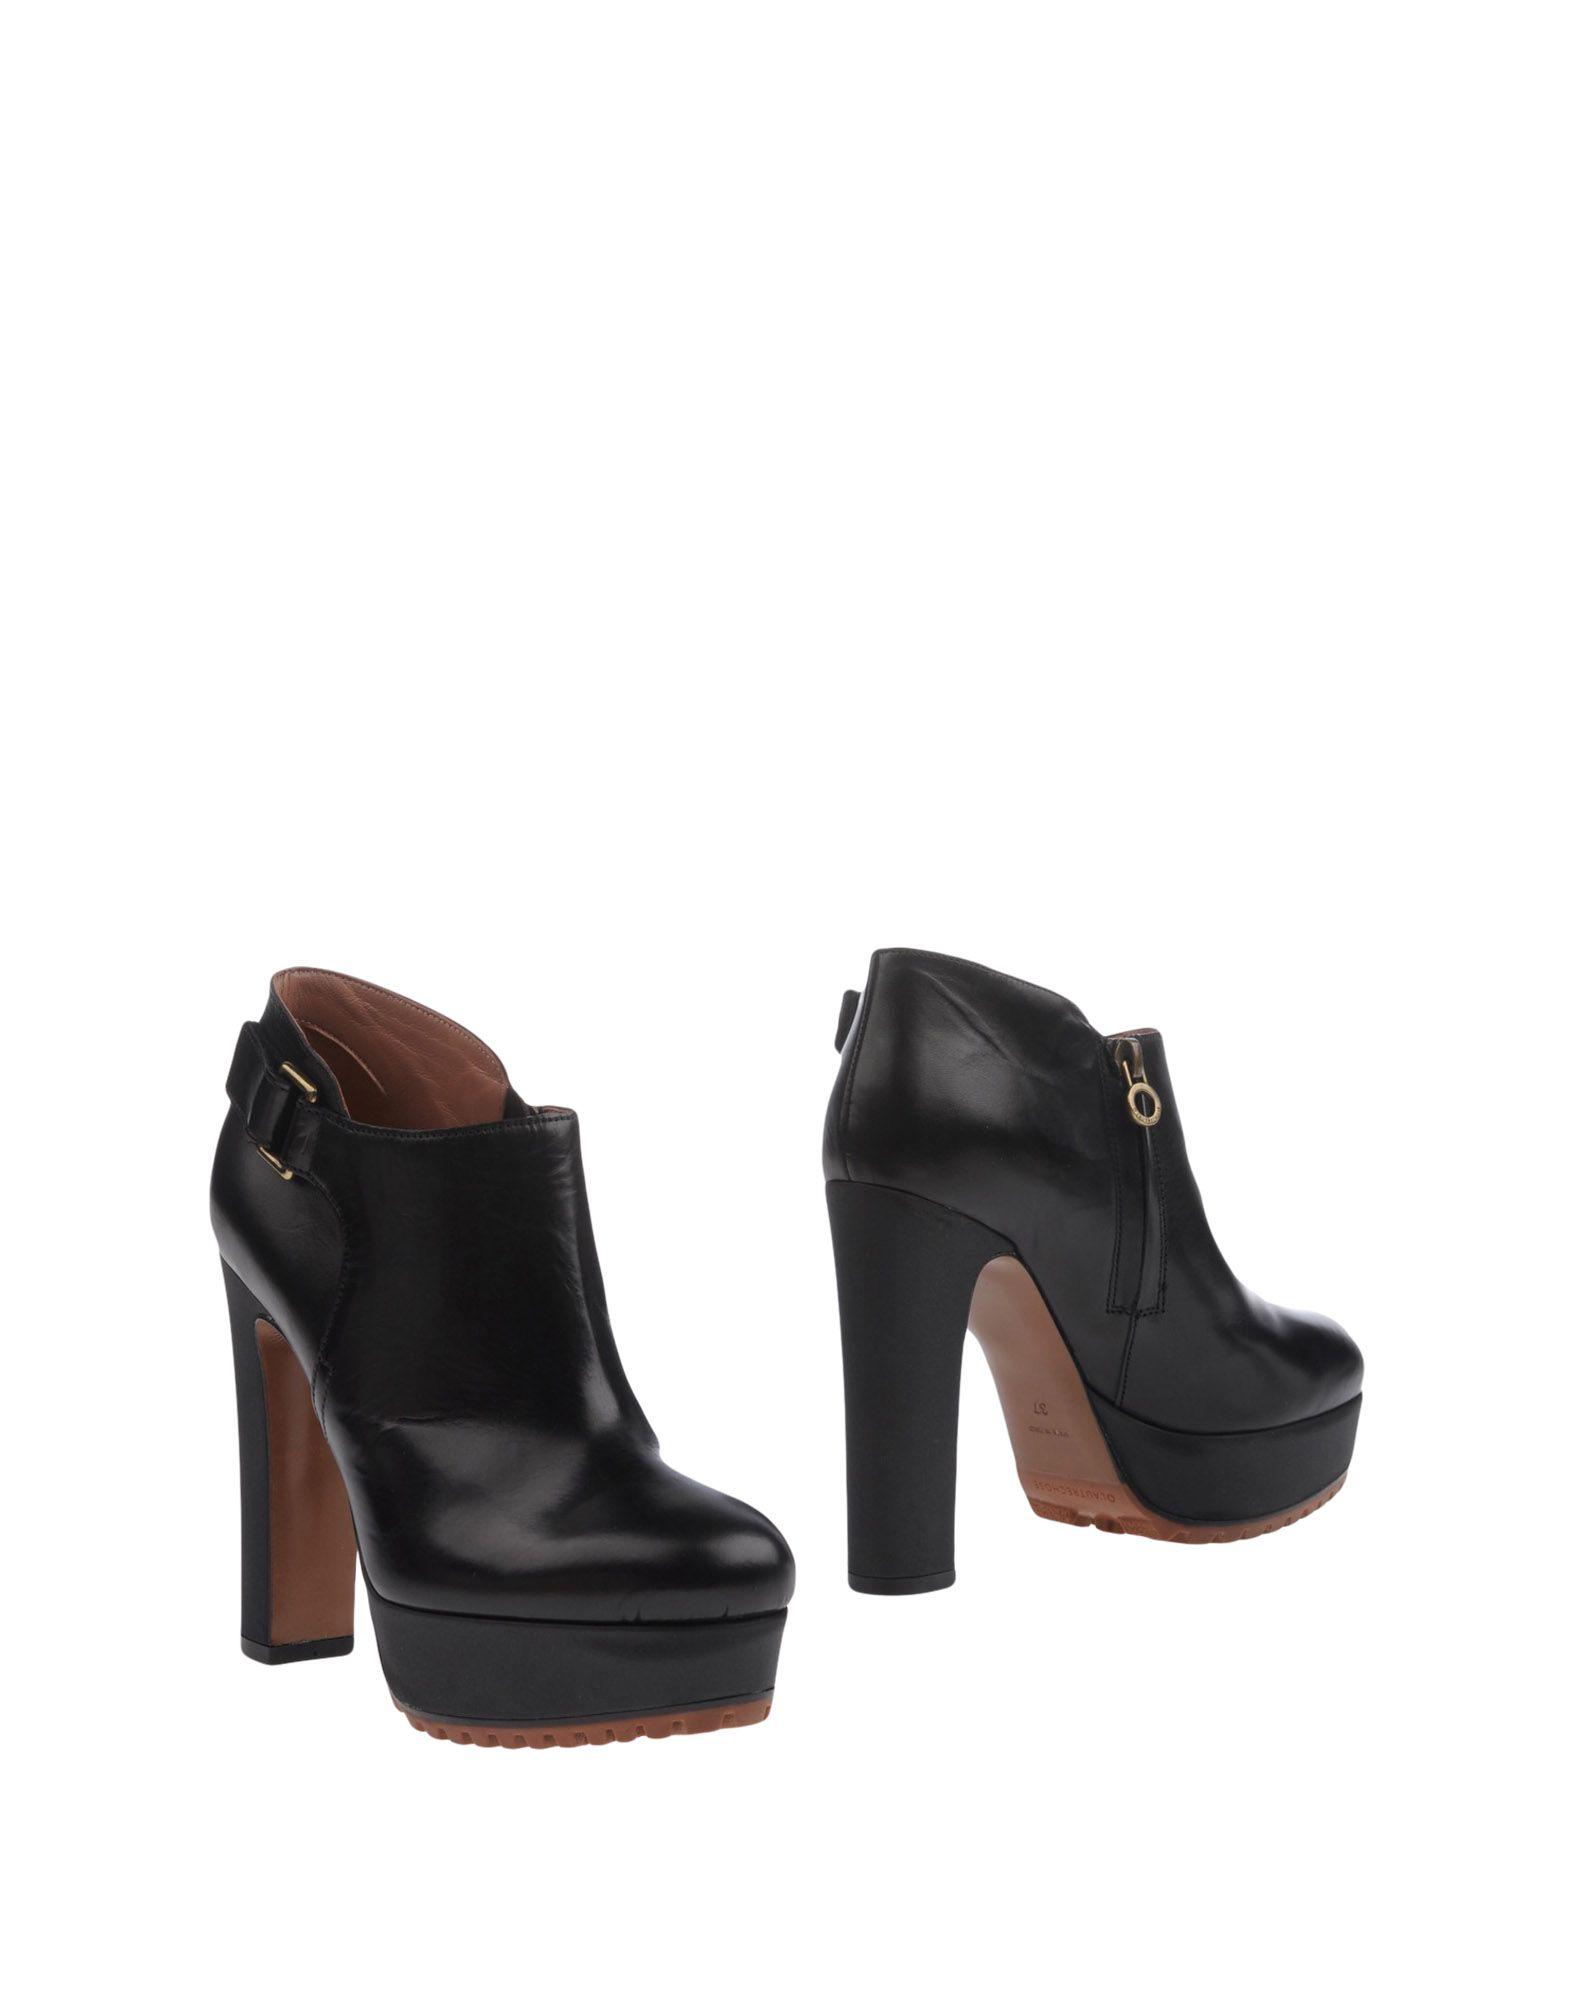 L' Autre Chose Stiefelette Damen  11239123ABGut aussehende strapazierfähige Schuhe